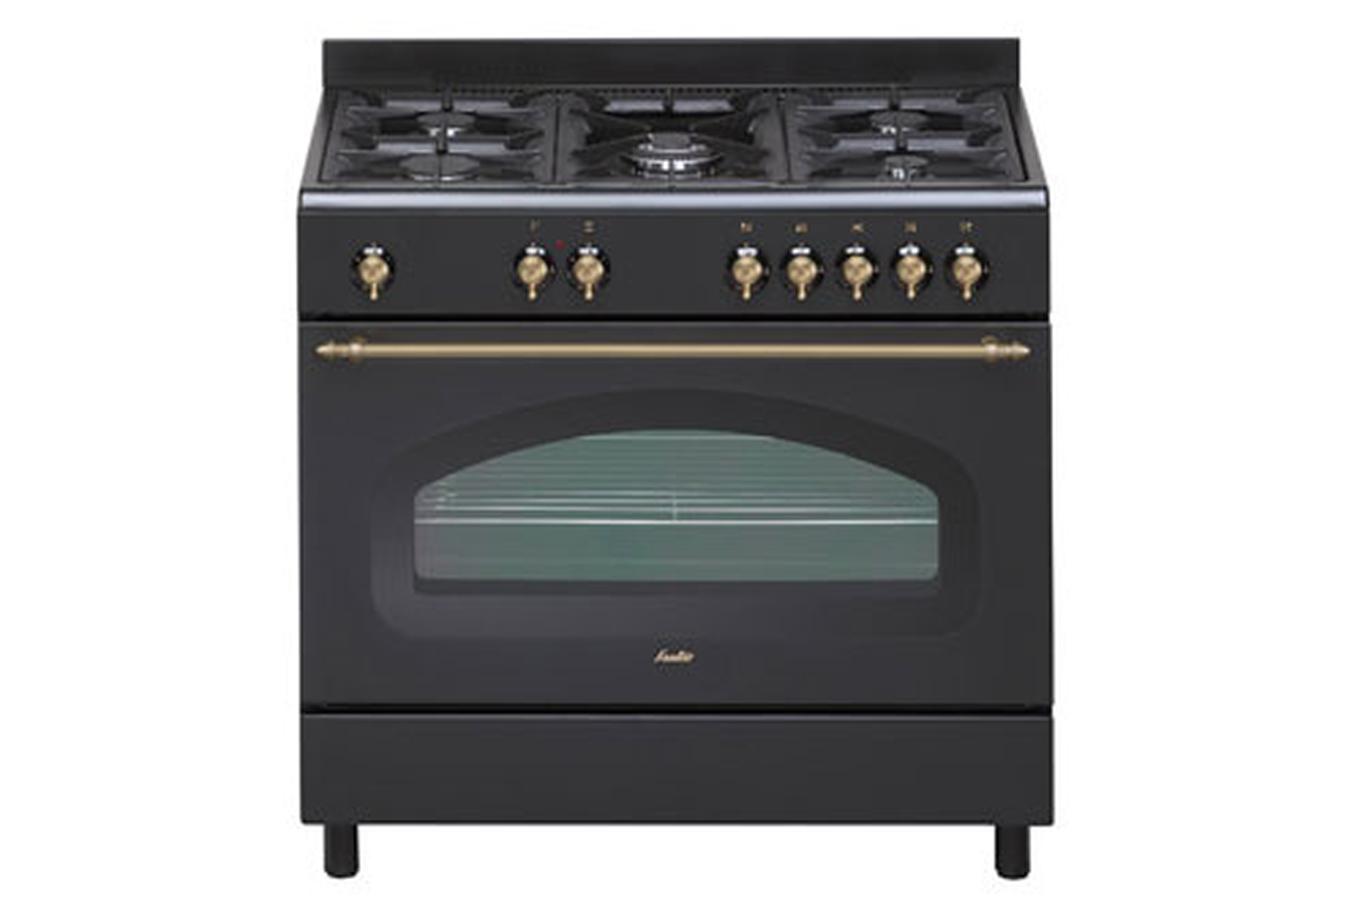 piano de cuisson sauter scm 1090 e 3219992 darty. Black Bedroom Furniture Sets. Home Design Ideas